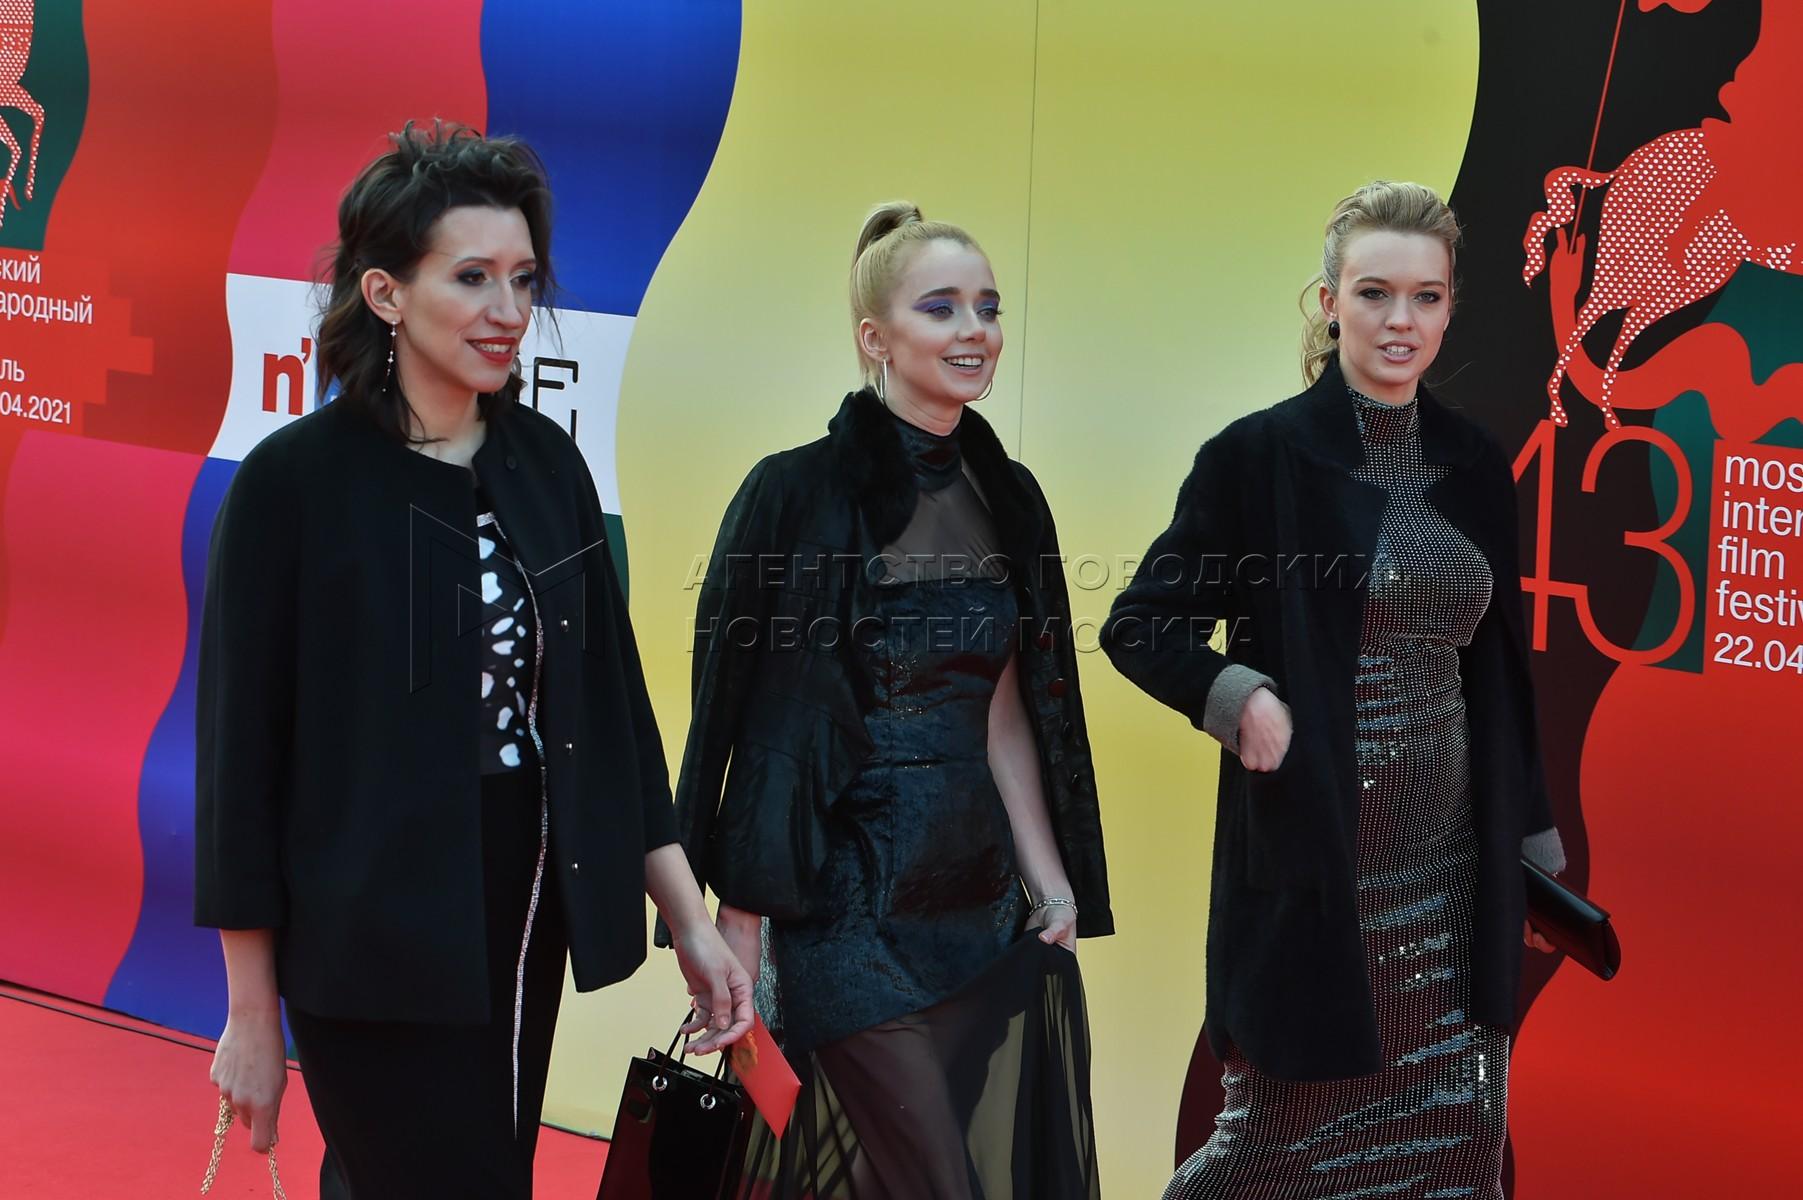 Актрисы Елена Борщева, Алена Чехова, Виктория Рунцова (слева направо) на церемонии закрытия 43-го Московского международного кинофестиваля (ММКФ).